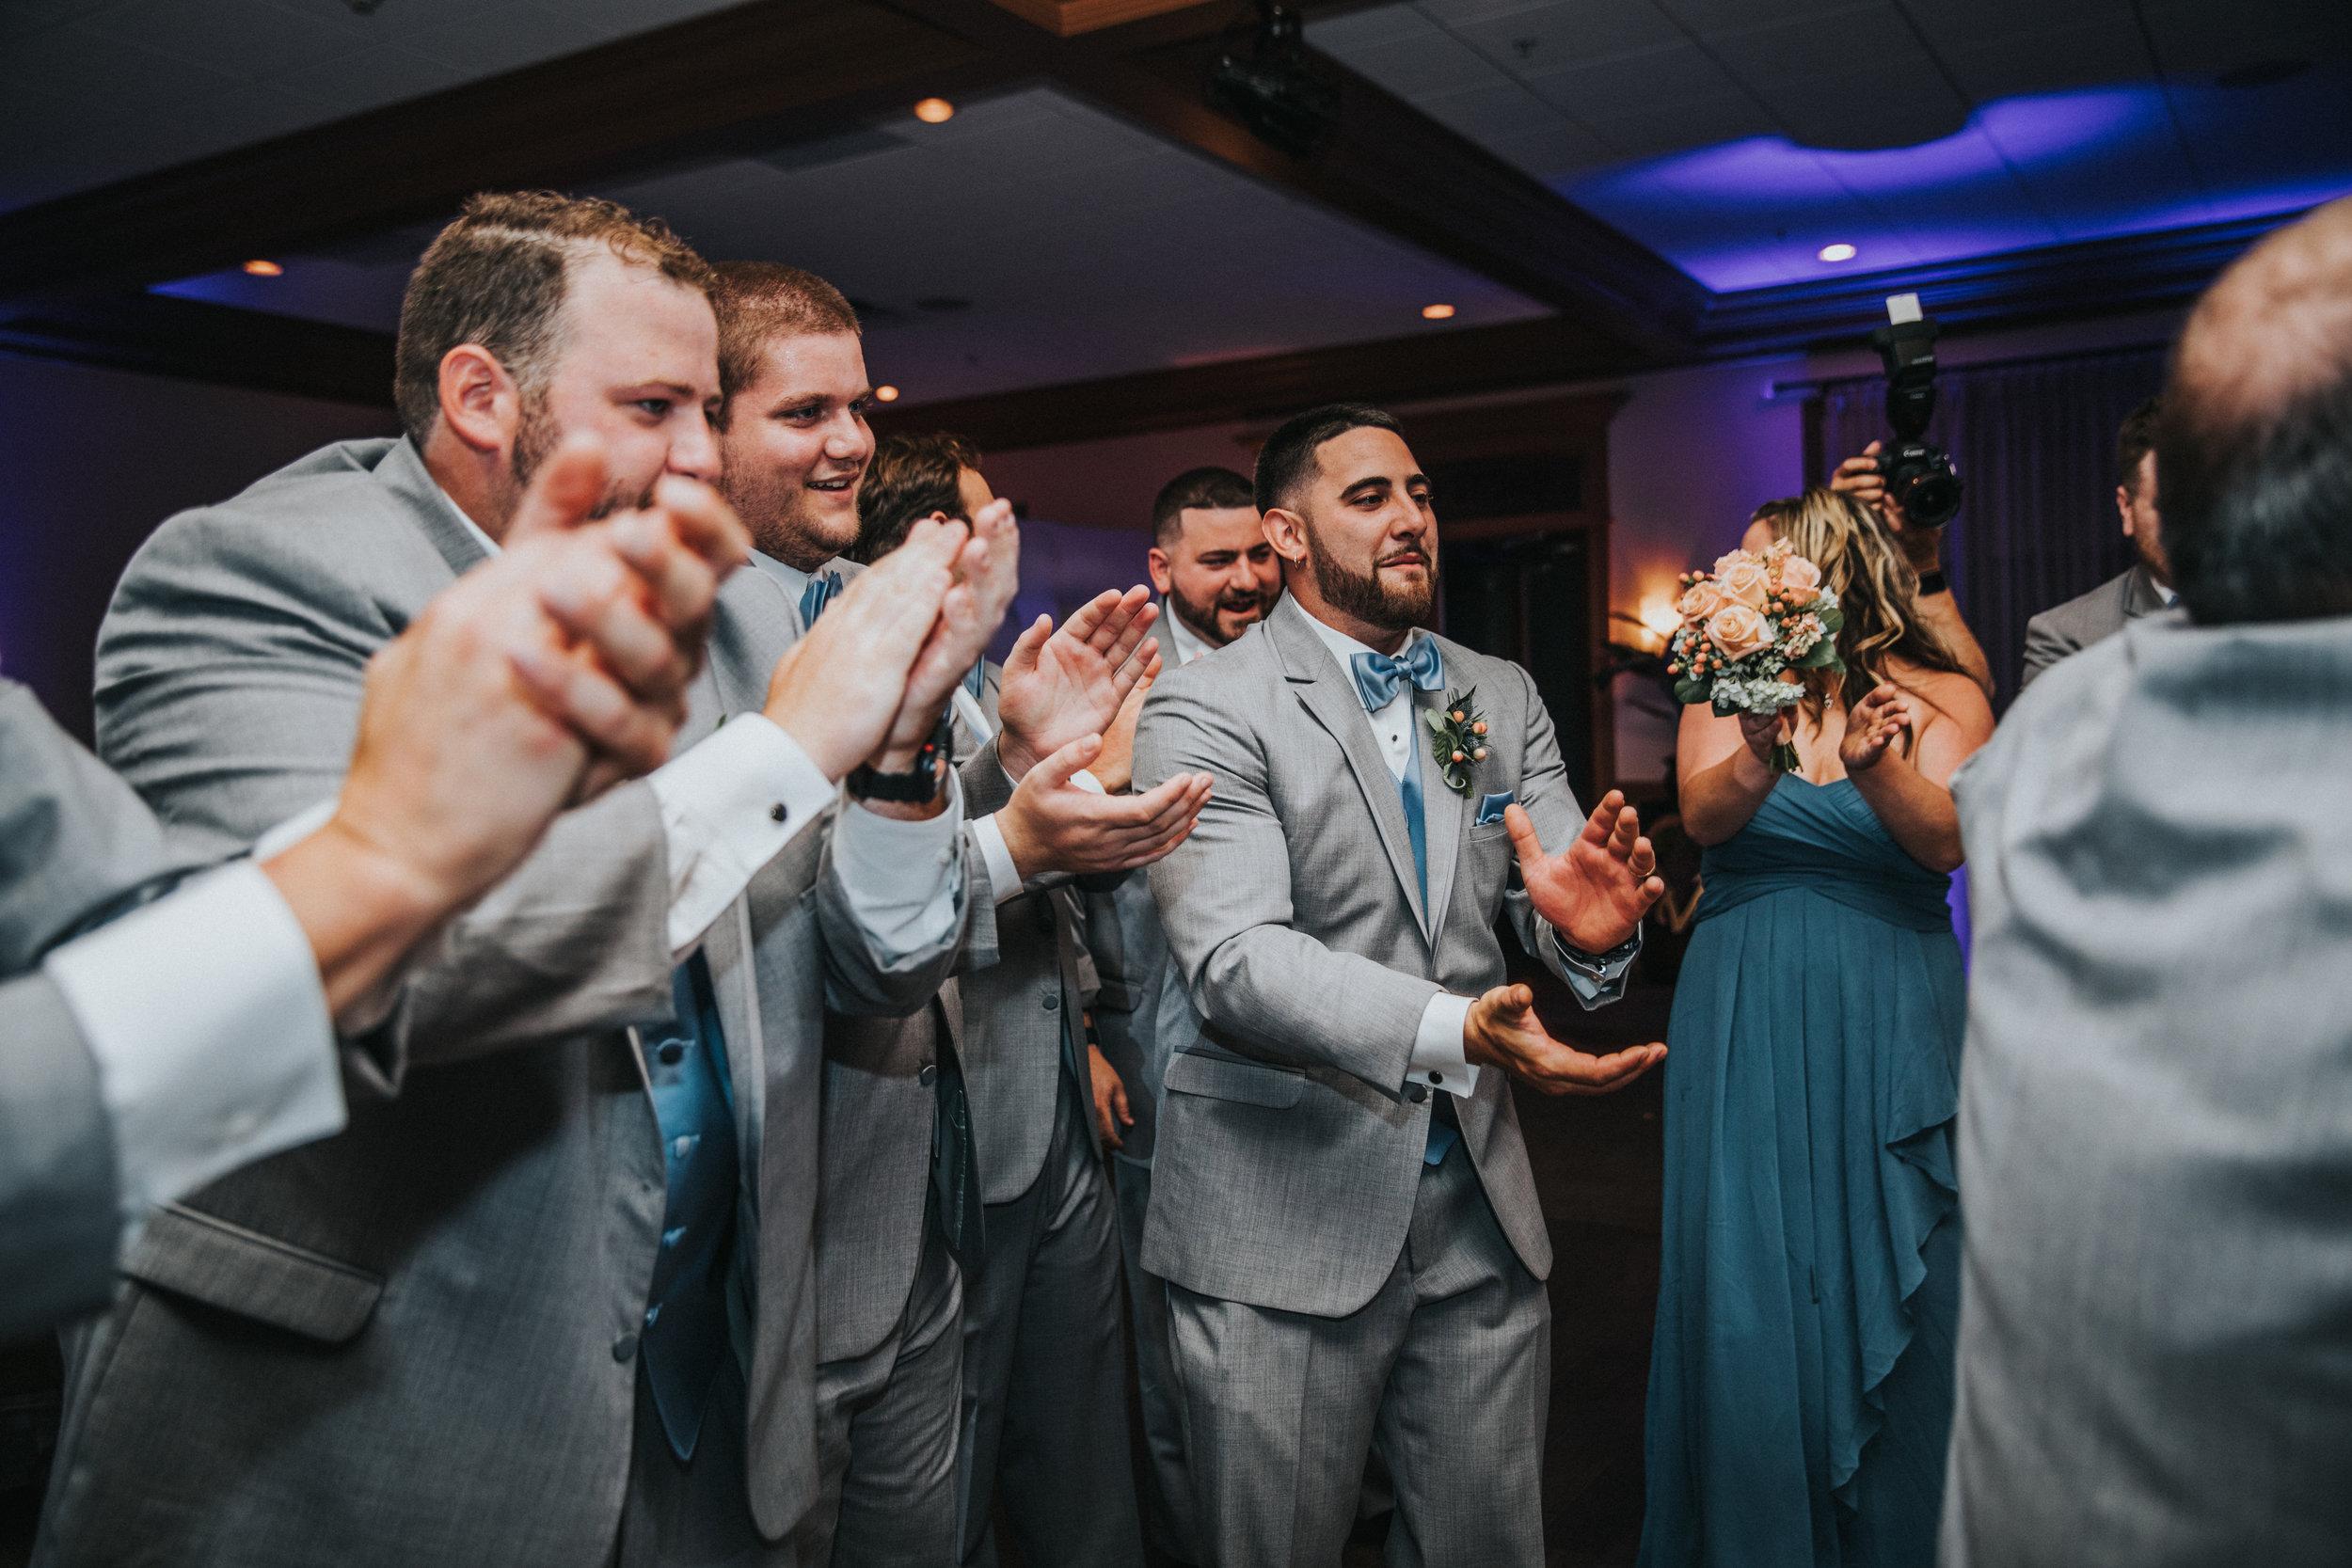 New-Jersey-Wedding-Photographer-JennaLynnPhotography-ValenzanoWinery-Reception-73.jpg